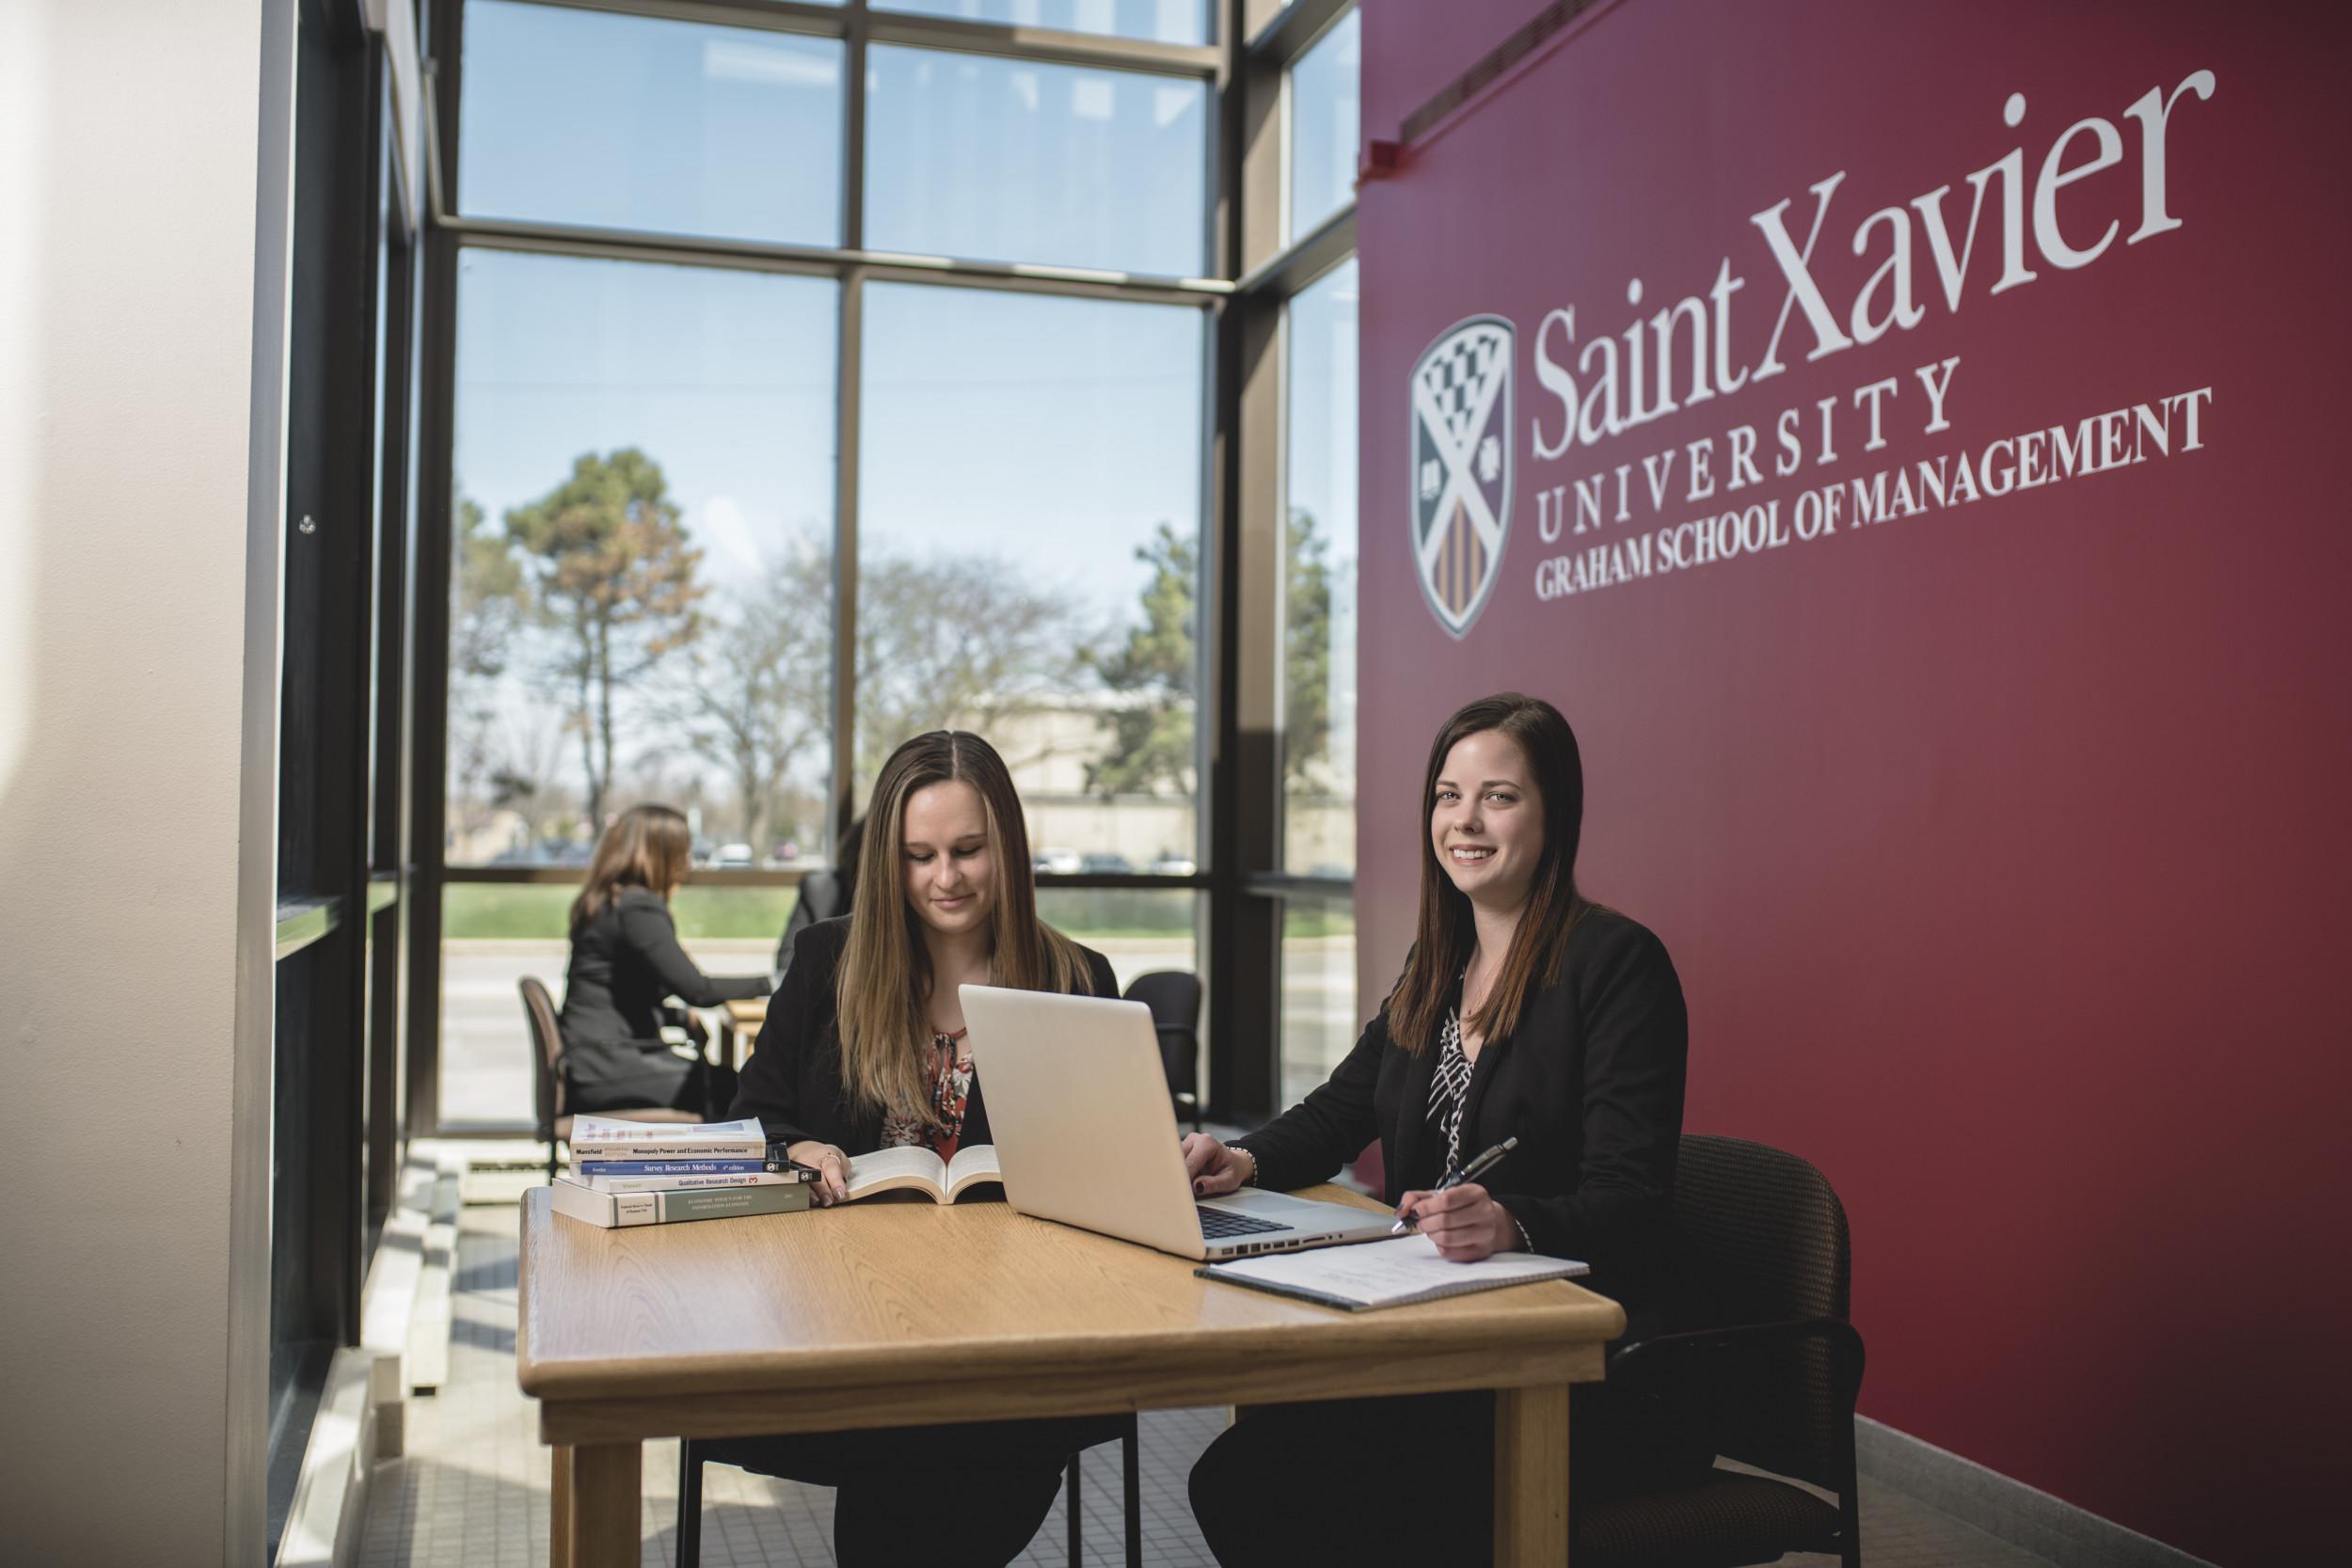 Saint Xavier University Graham School of Management